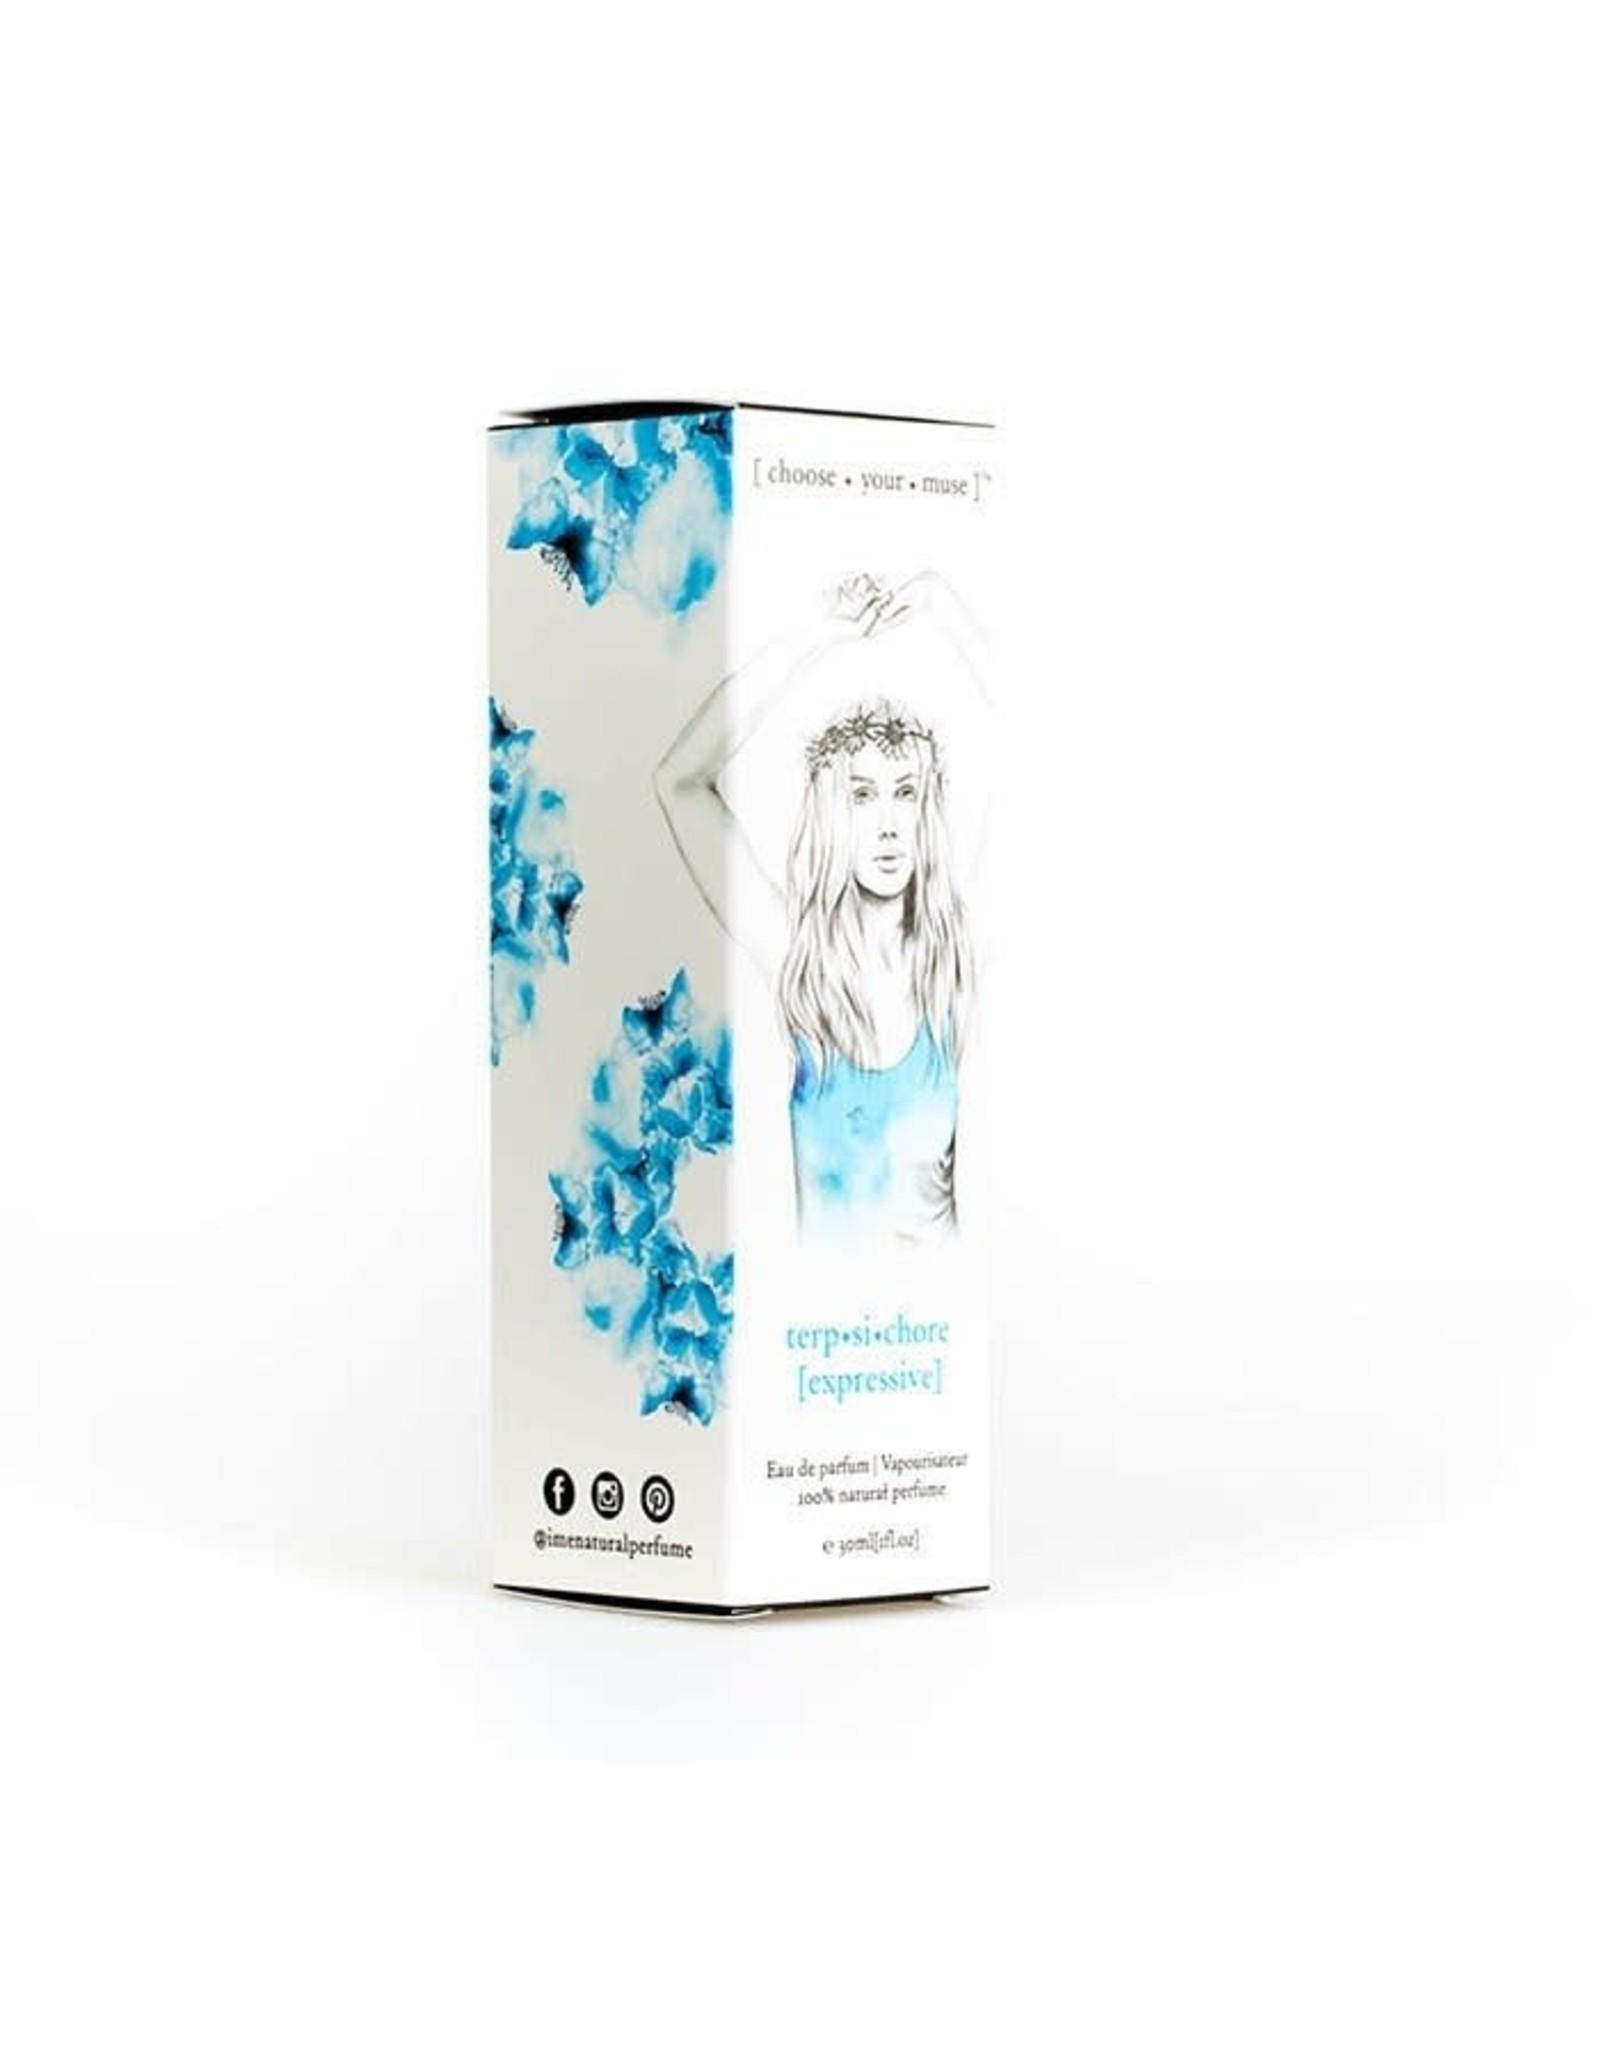 IME Natural Perfume - Terpsichore (Expressive) - 30ml